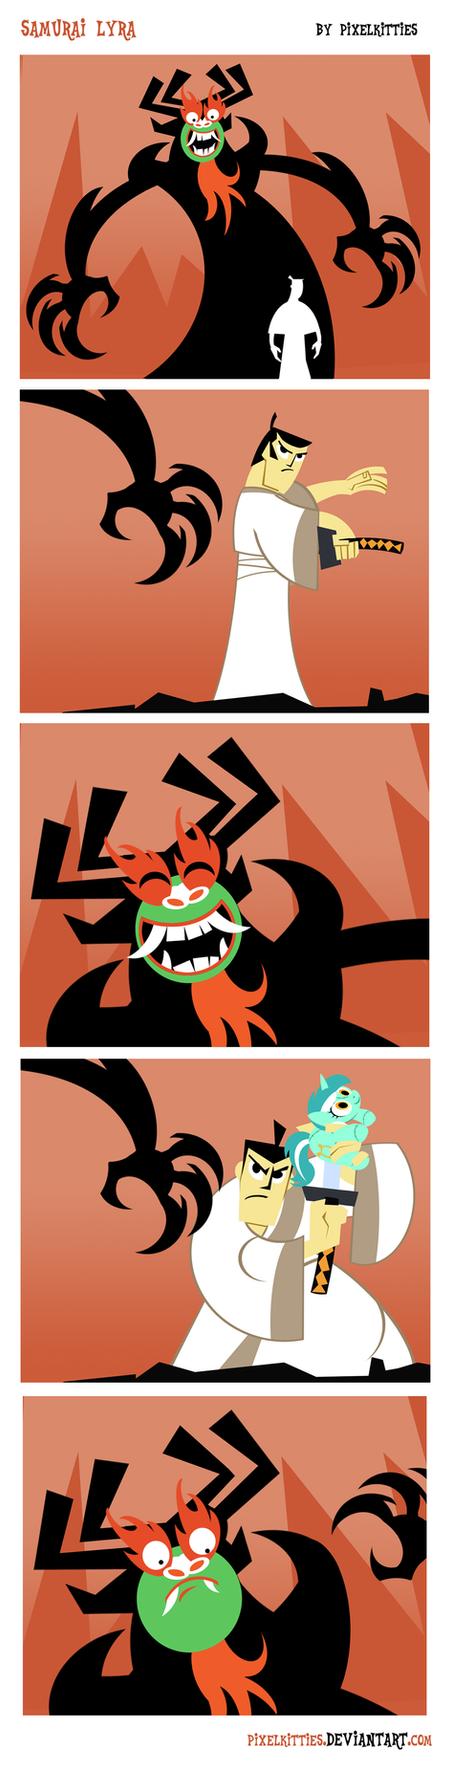 Samurai Lyra Comic by PixelKitties